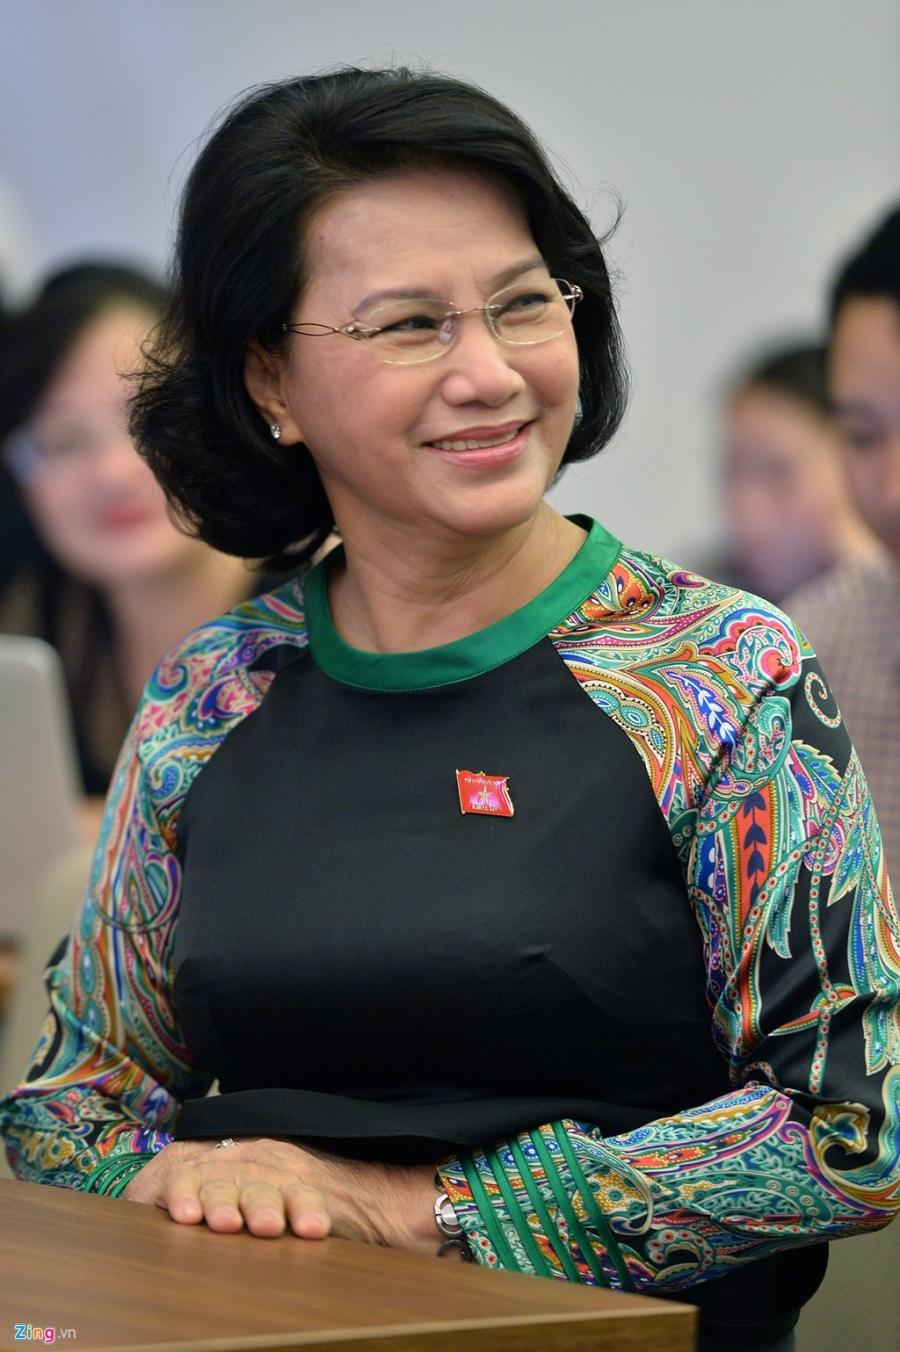 Nhung bo ao dai cua nu Chu tich Quoc hoi Nguyen Thi Kim Ngan hinh anh 15